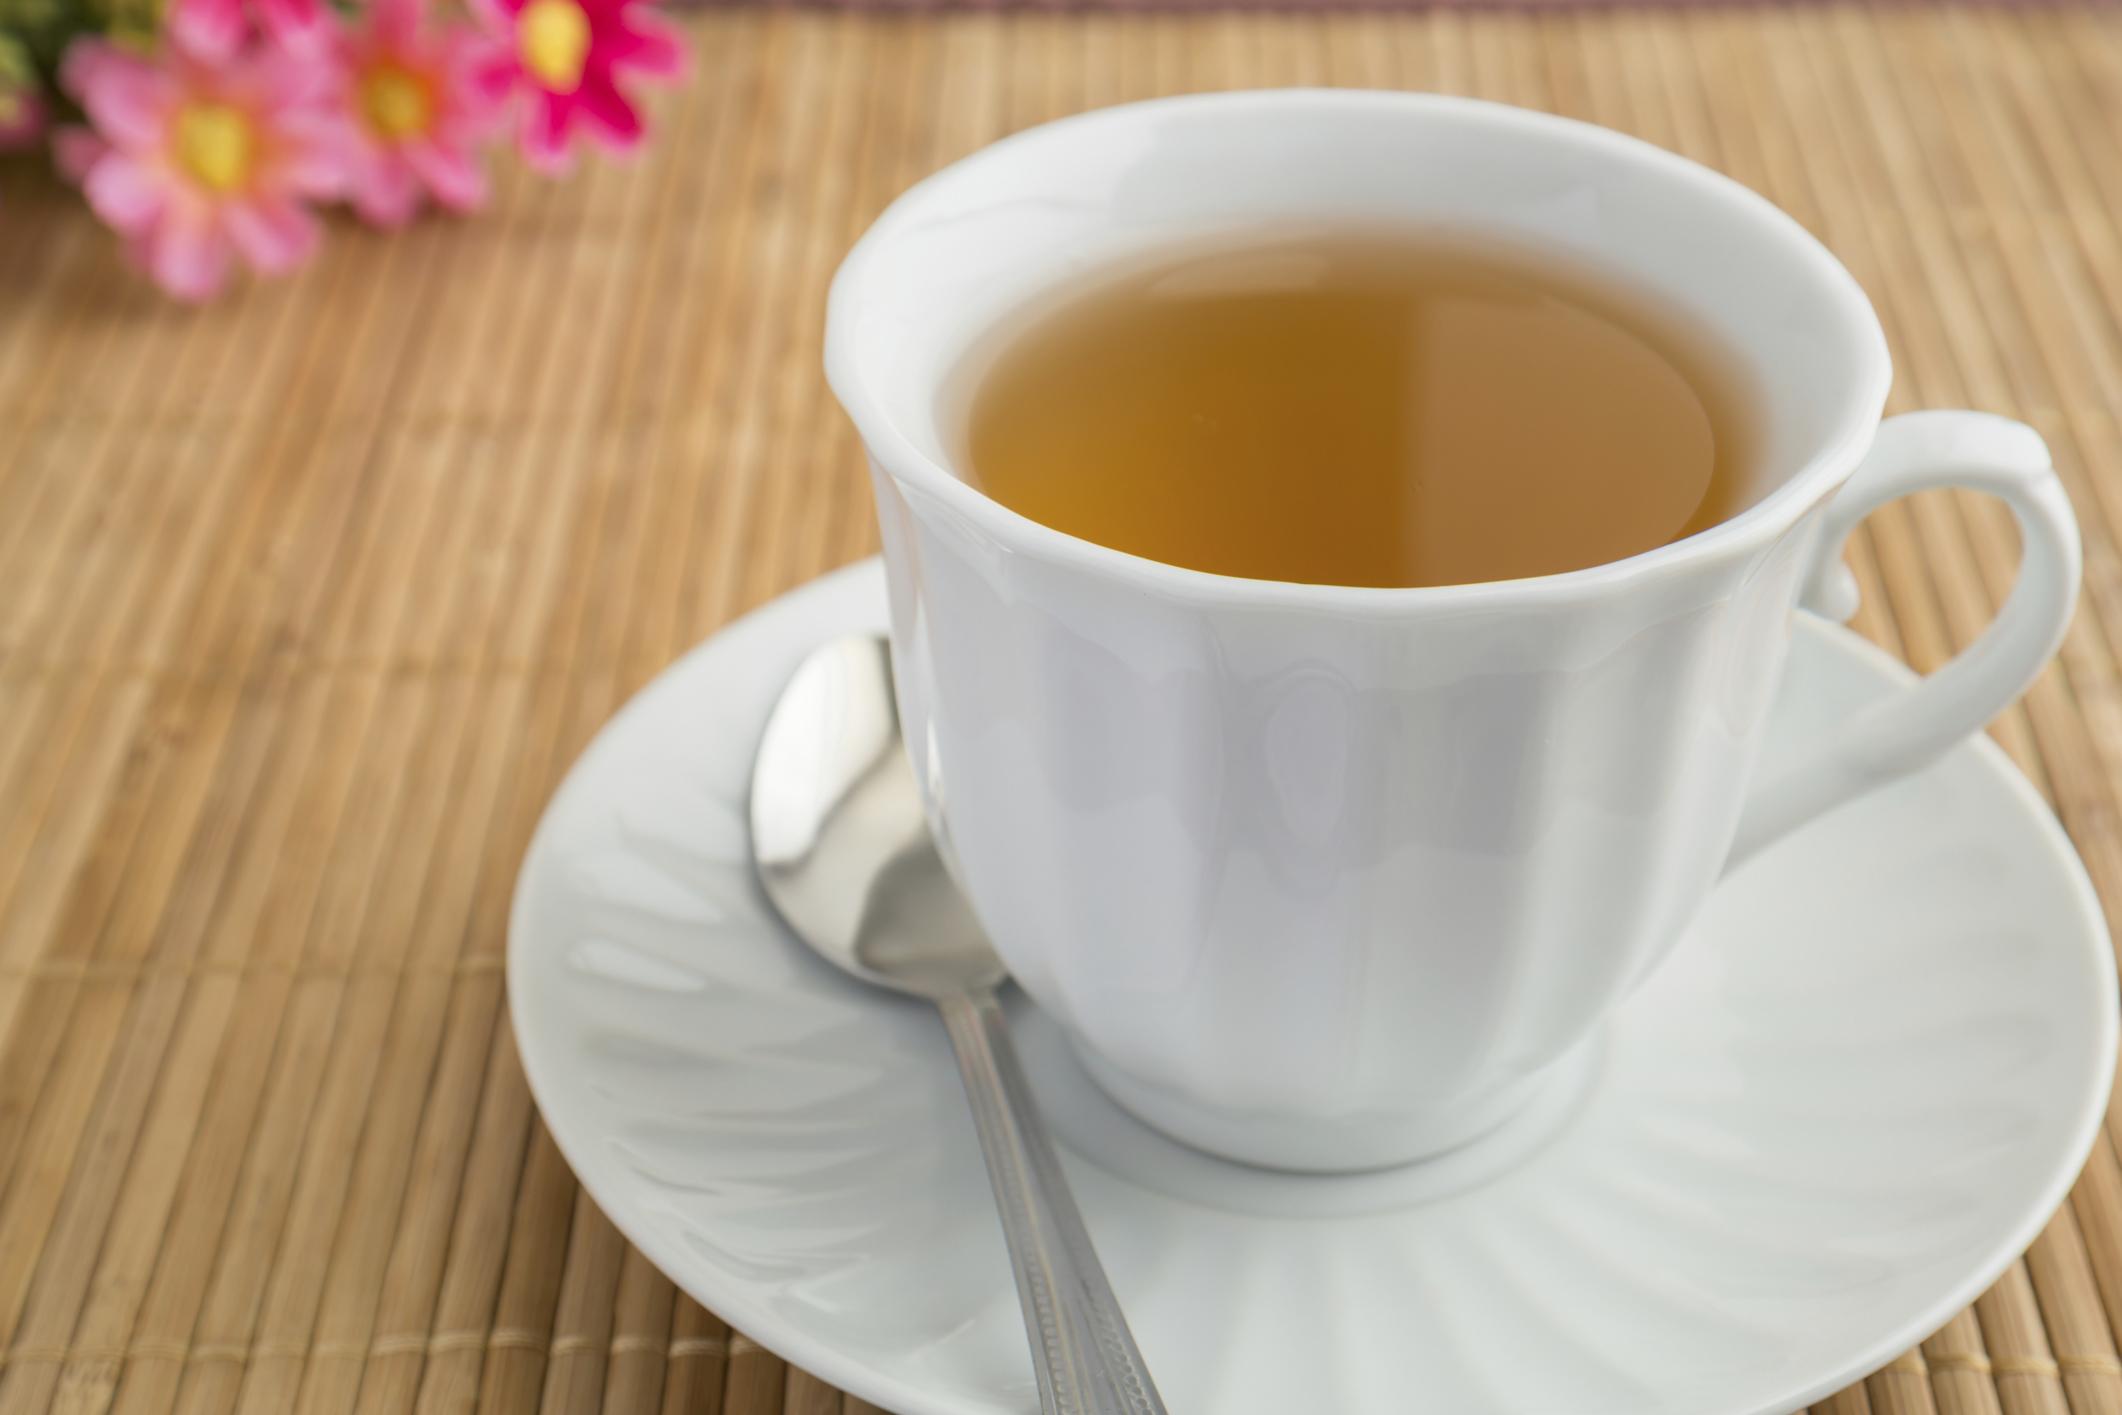 Chinese herbal insomnia tea - Chinese Herbal Insomnia Tea 62